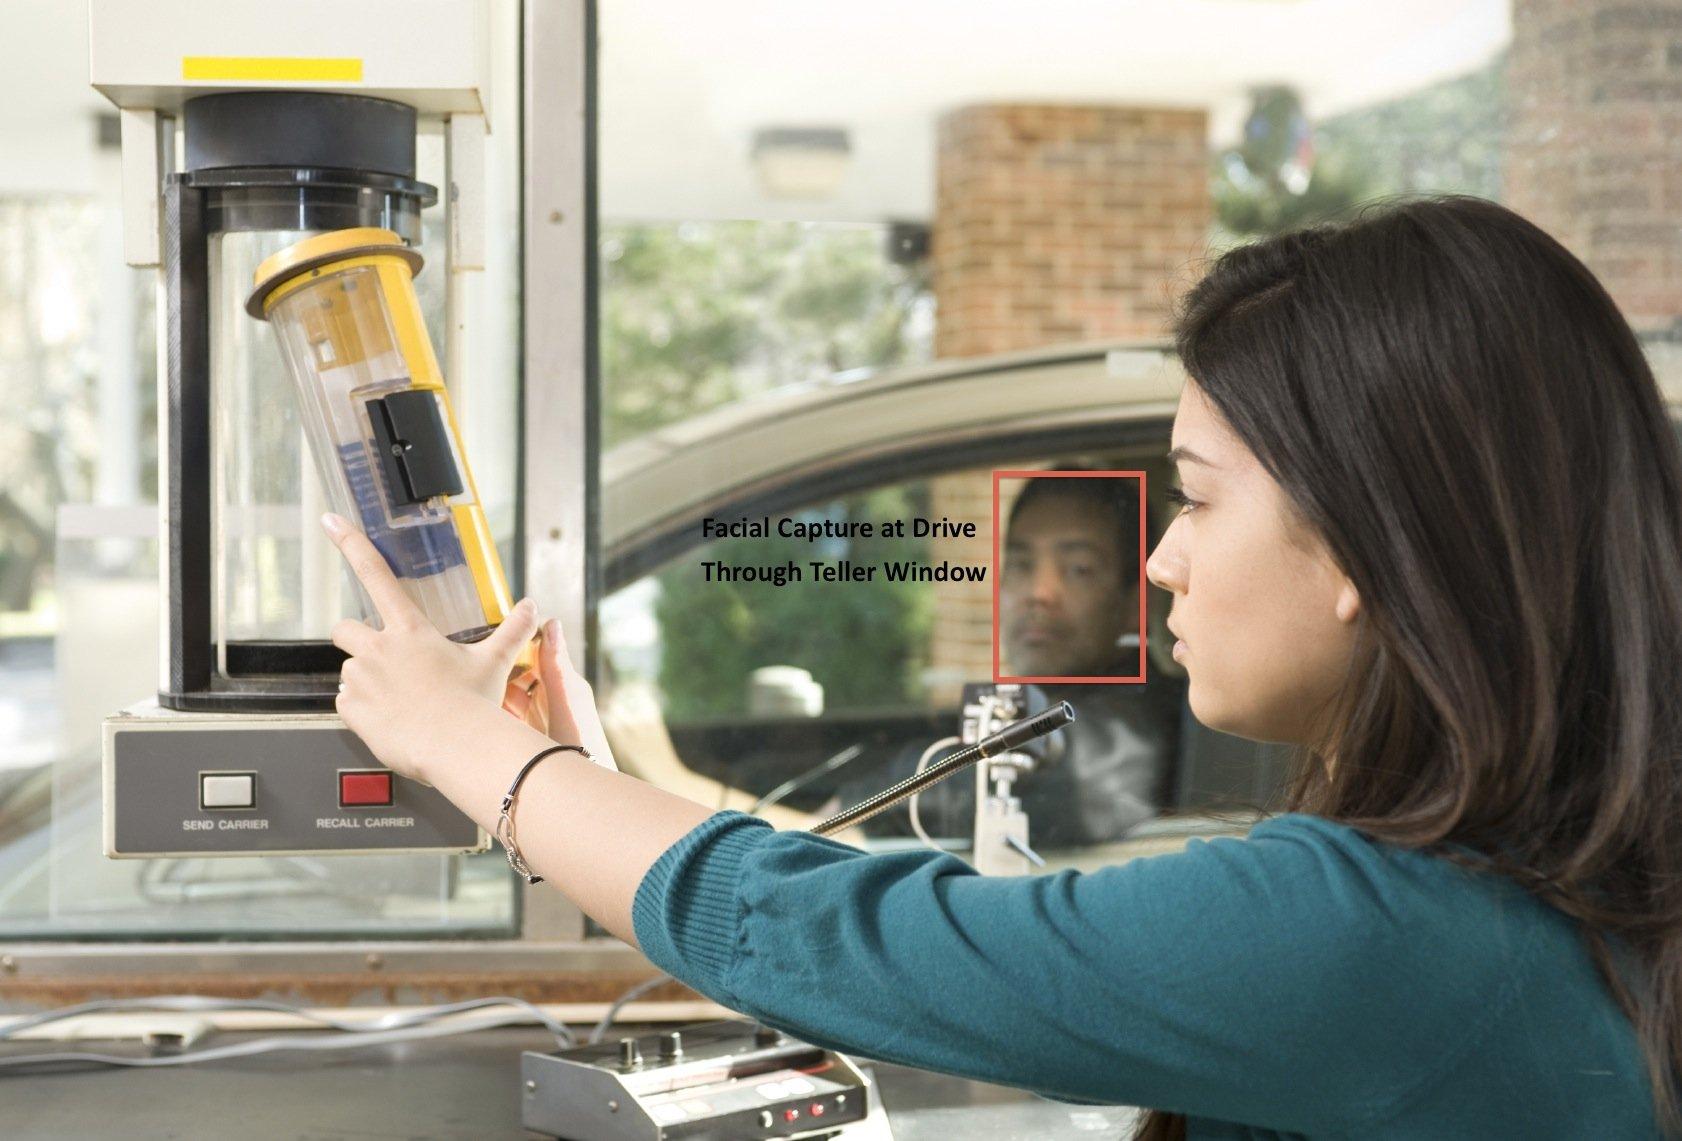 Drive Teller Bank Window